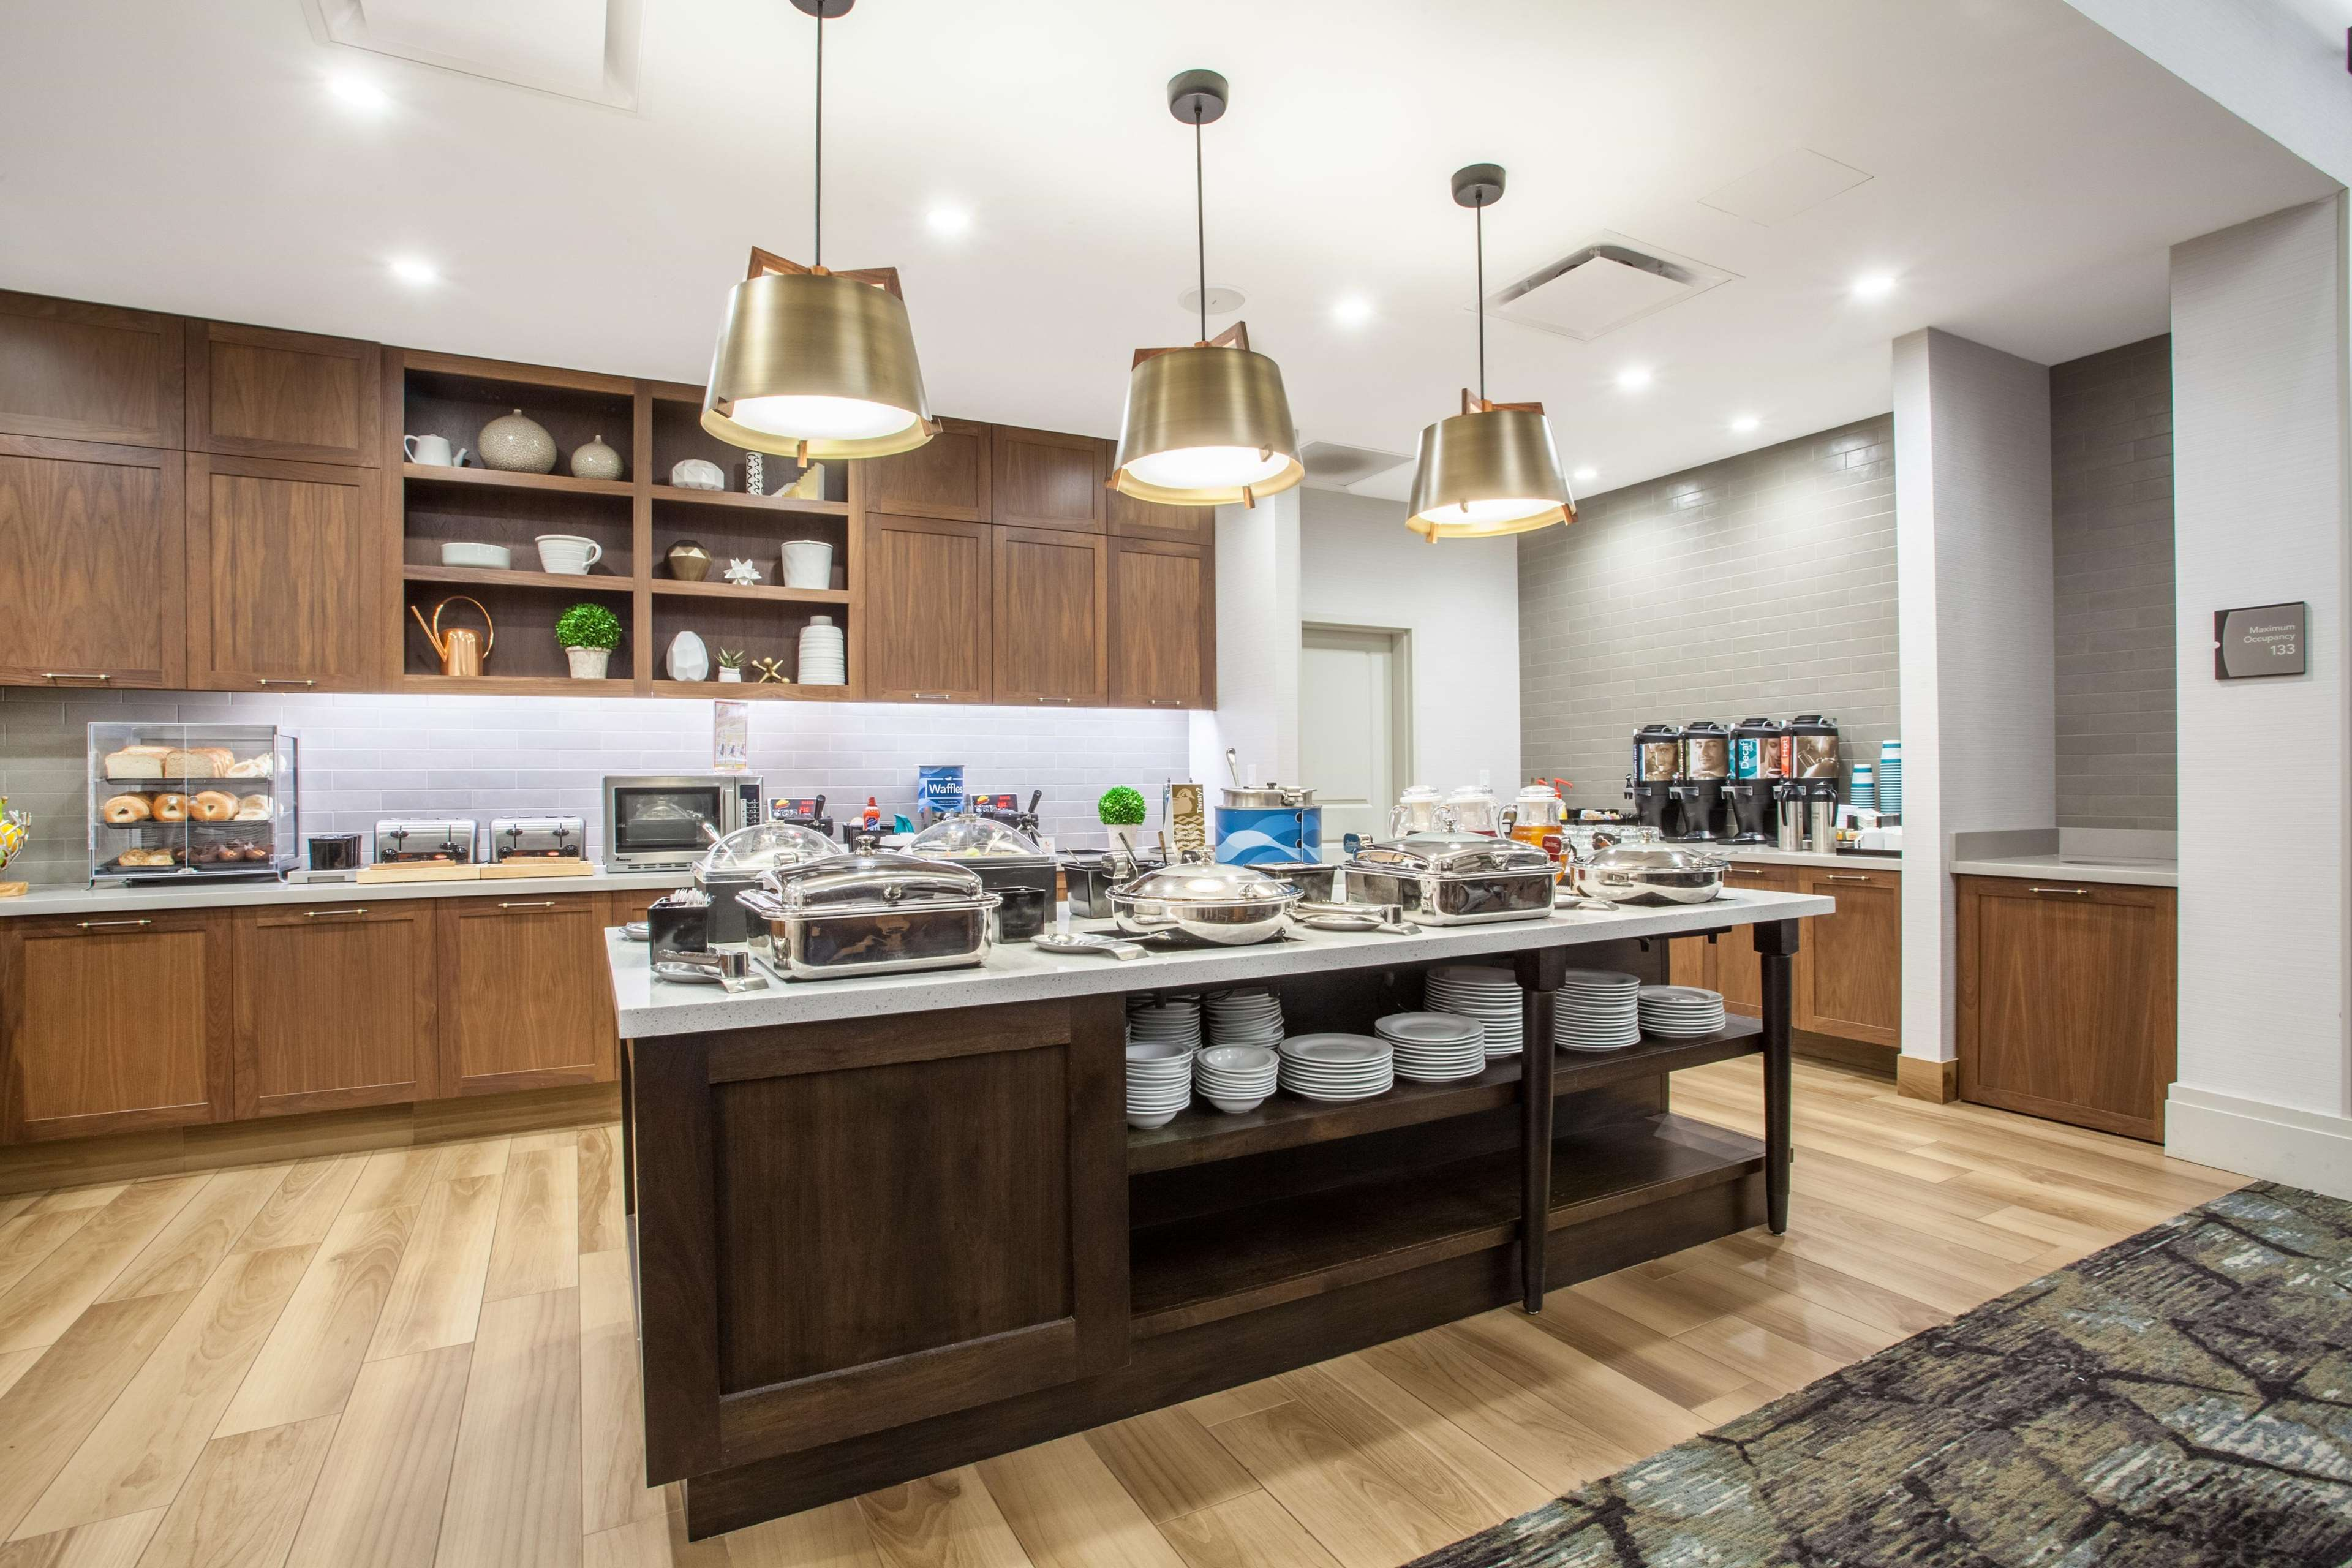 Homewood Suites by Hilton Saratoga Springs image 30